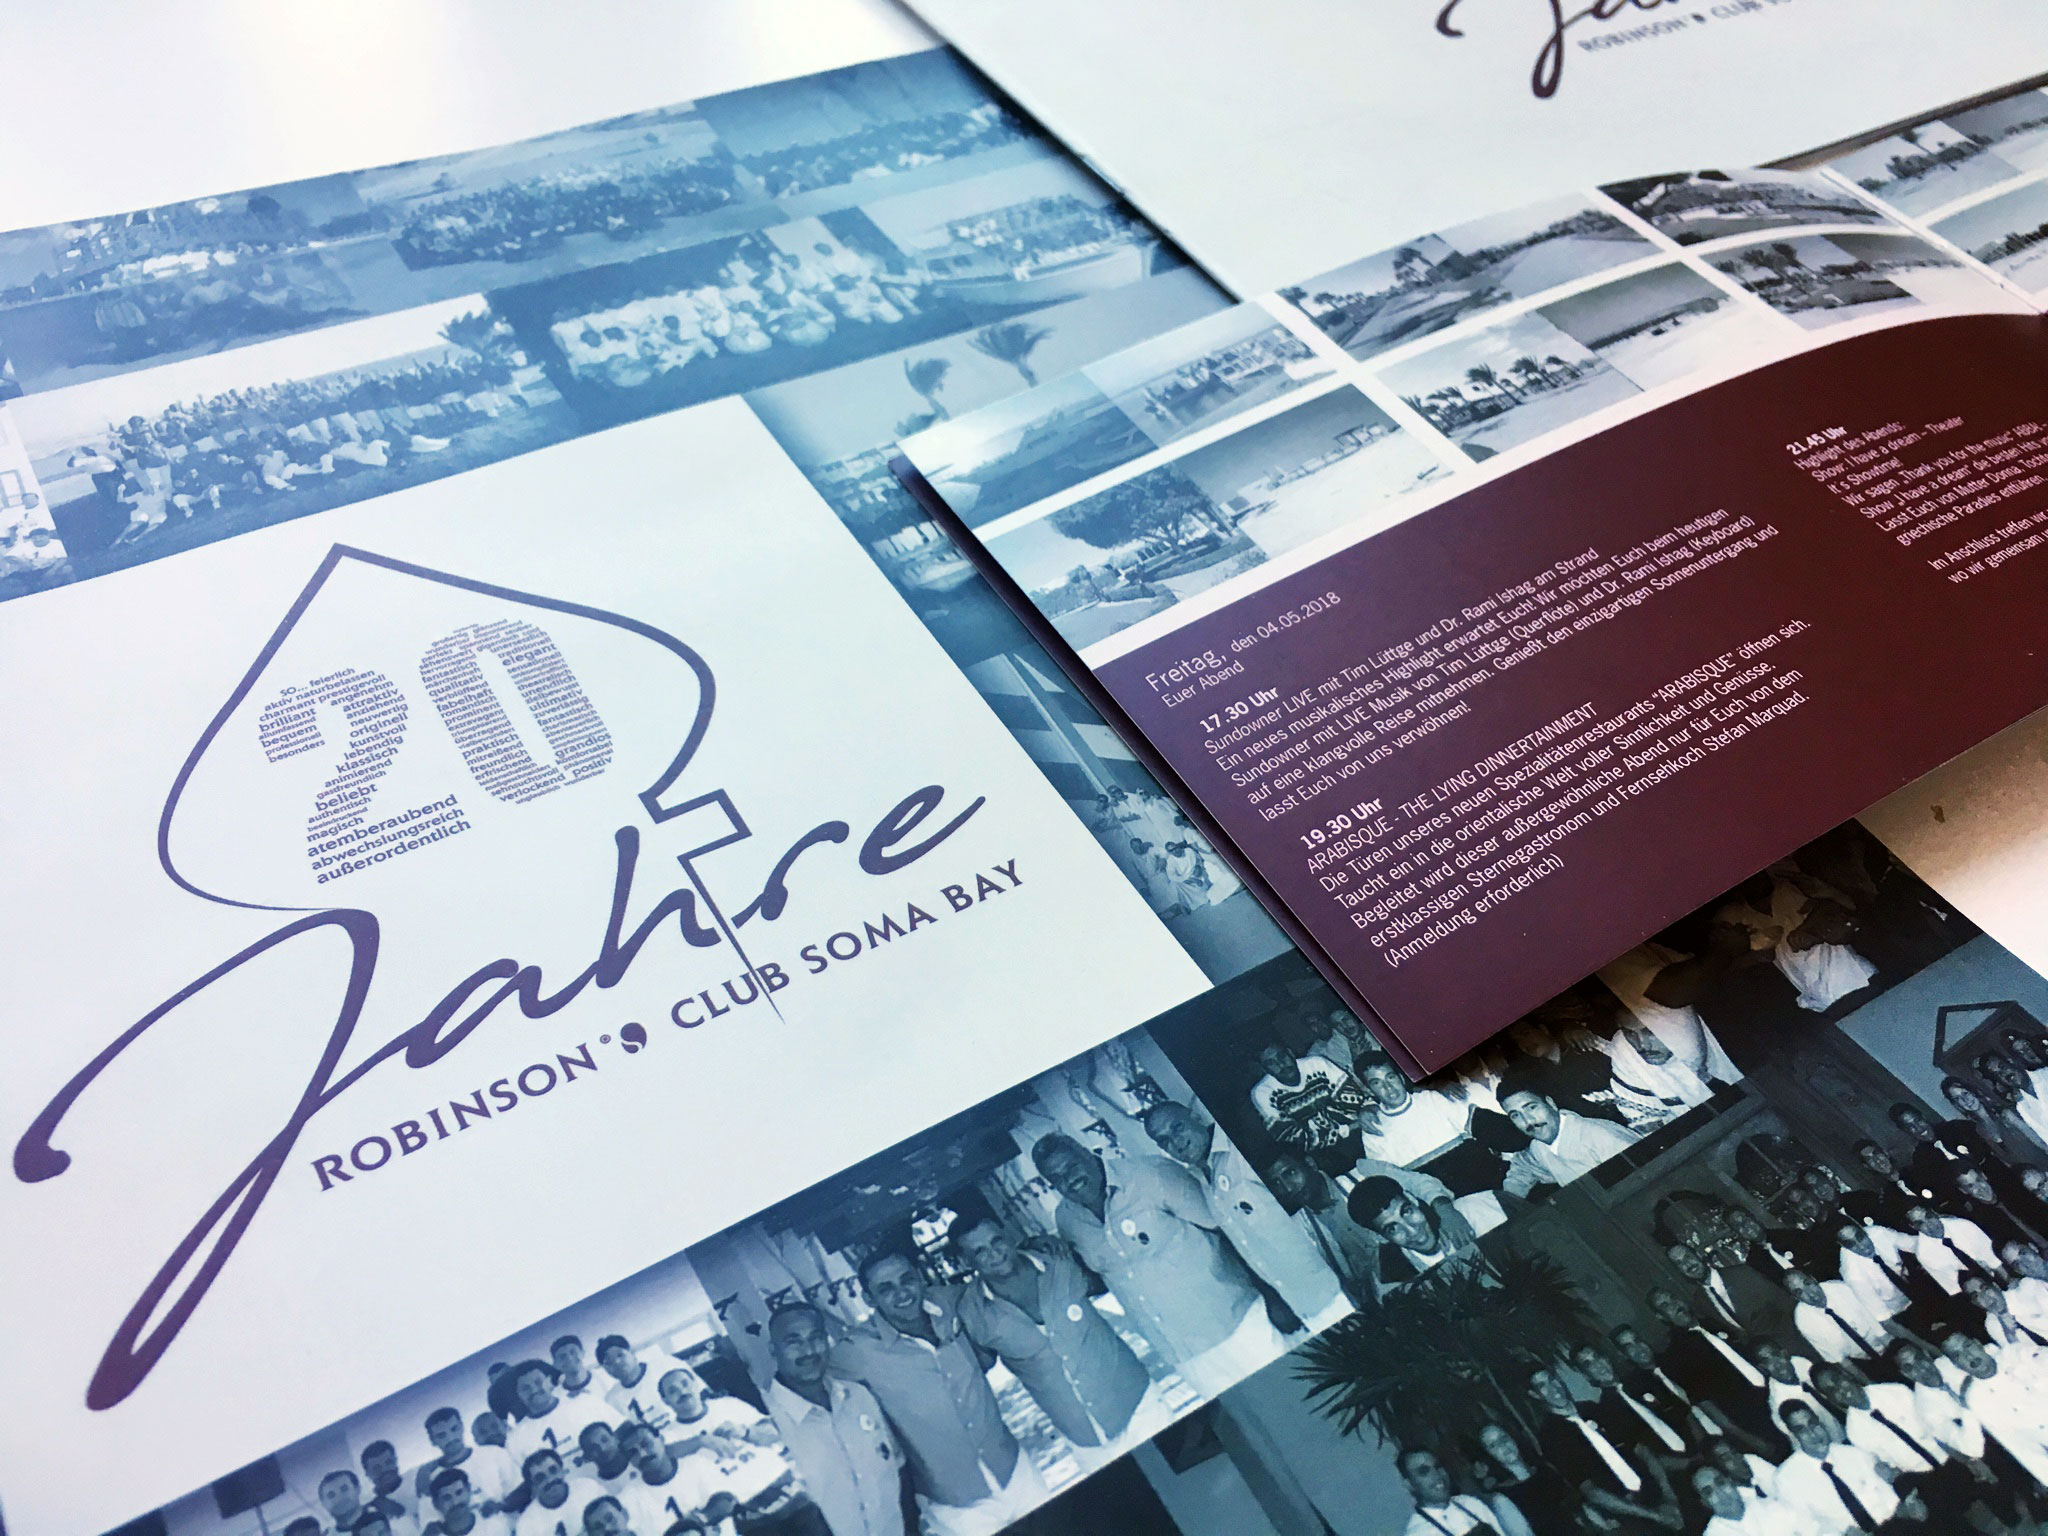 20 Jahre Robinson Club Soma Bay